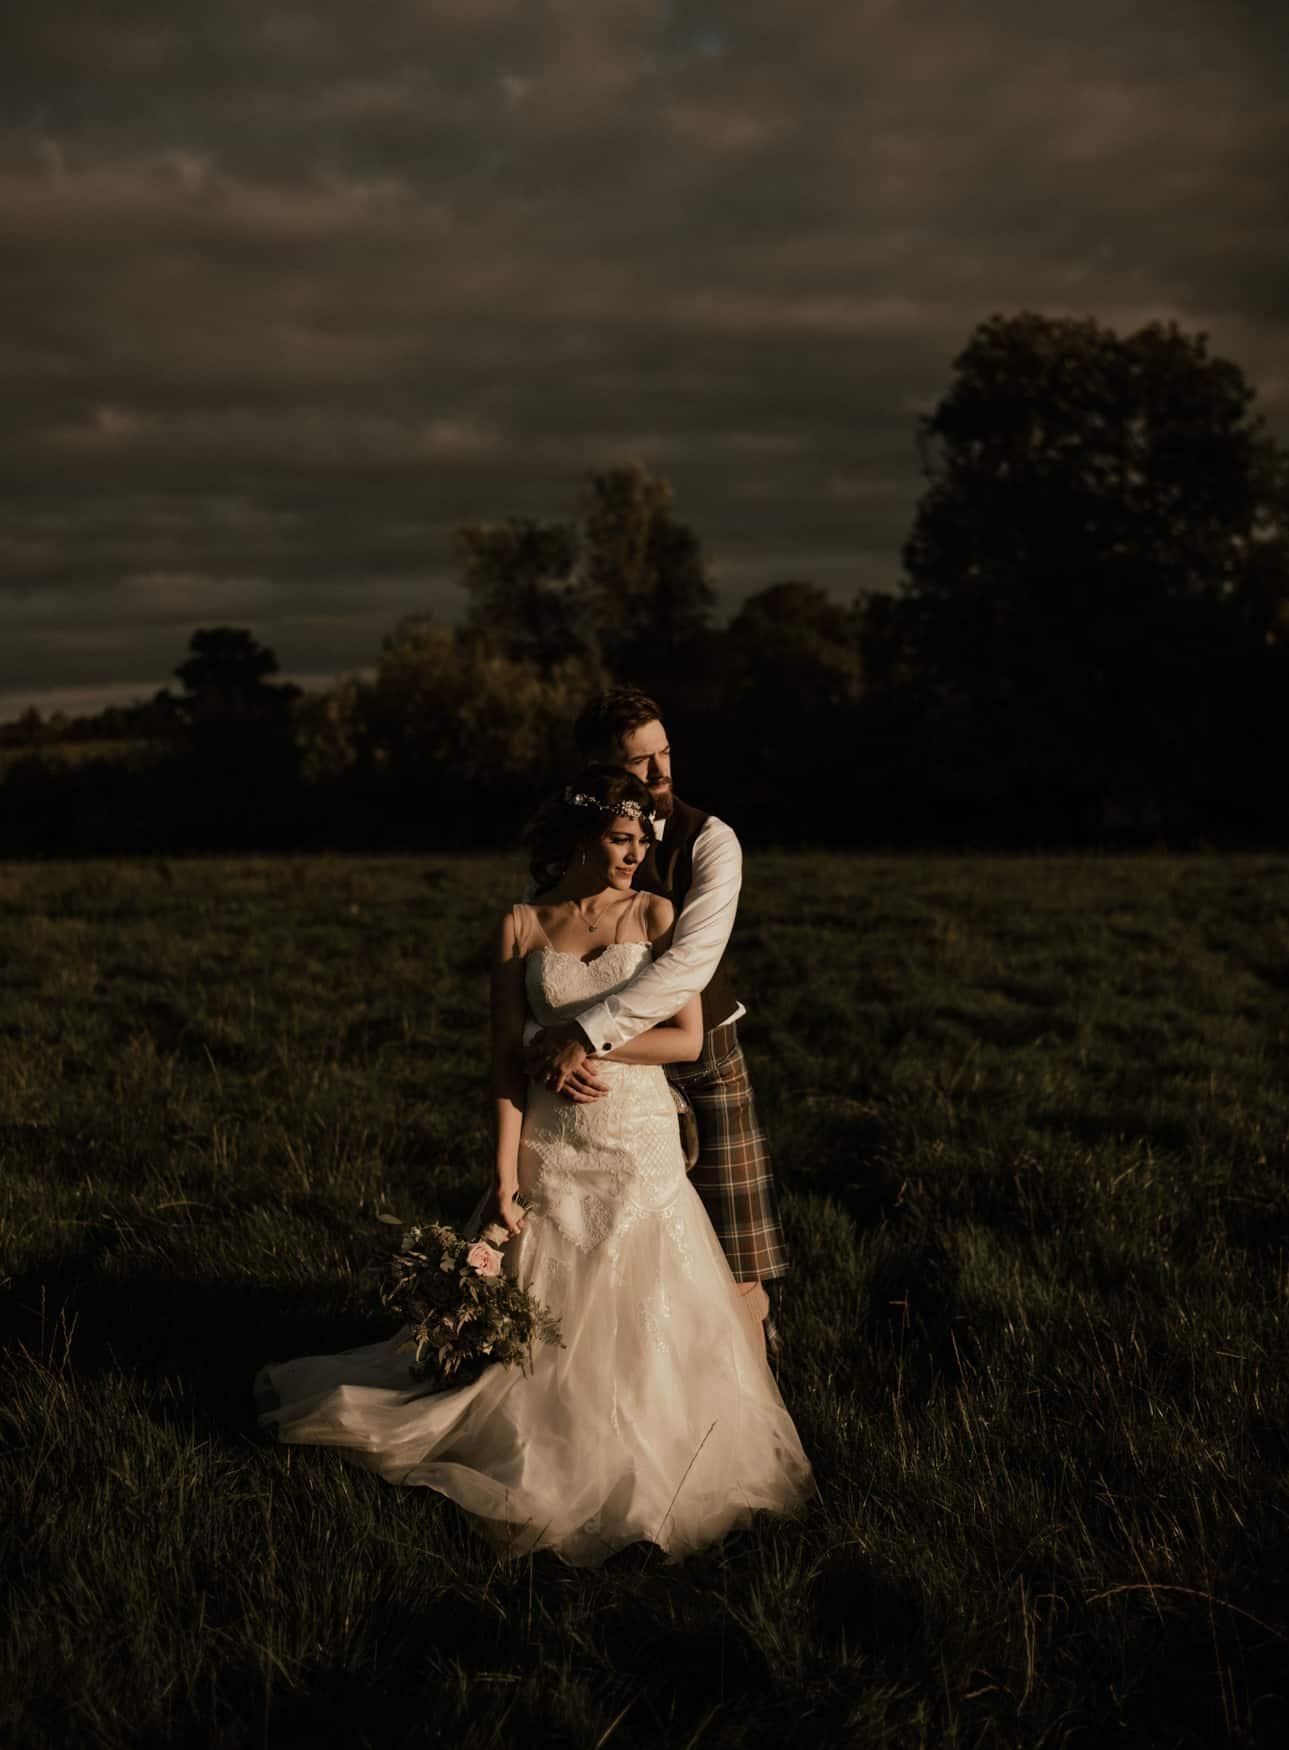 sun kissed Bride and groom